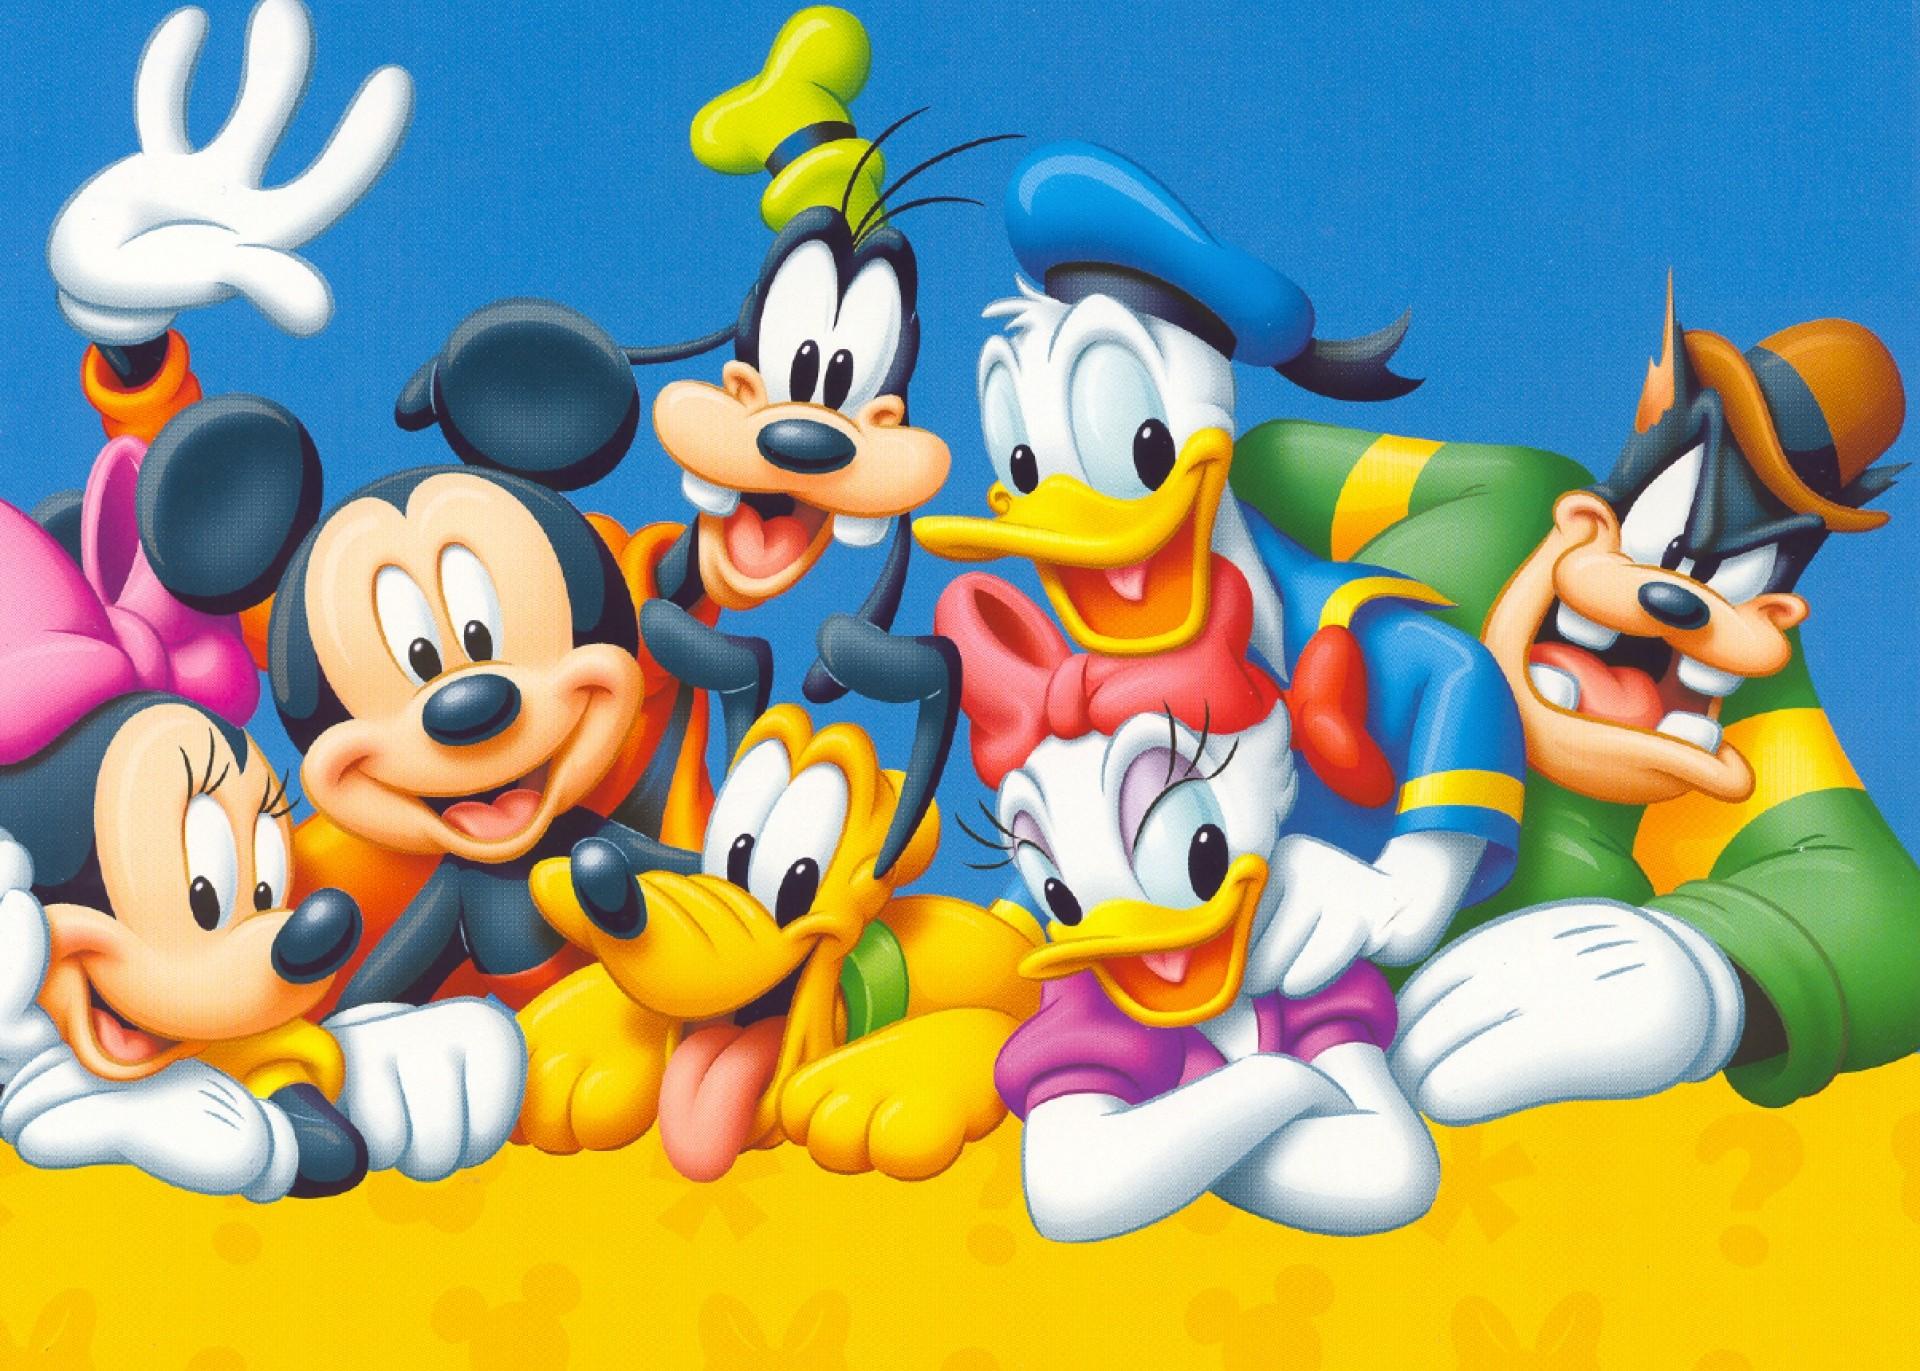 Disney wallpaper hd all characters